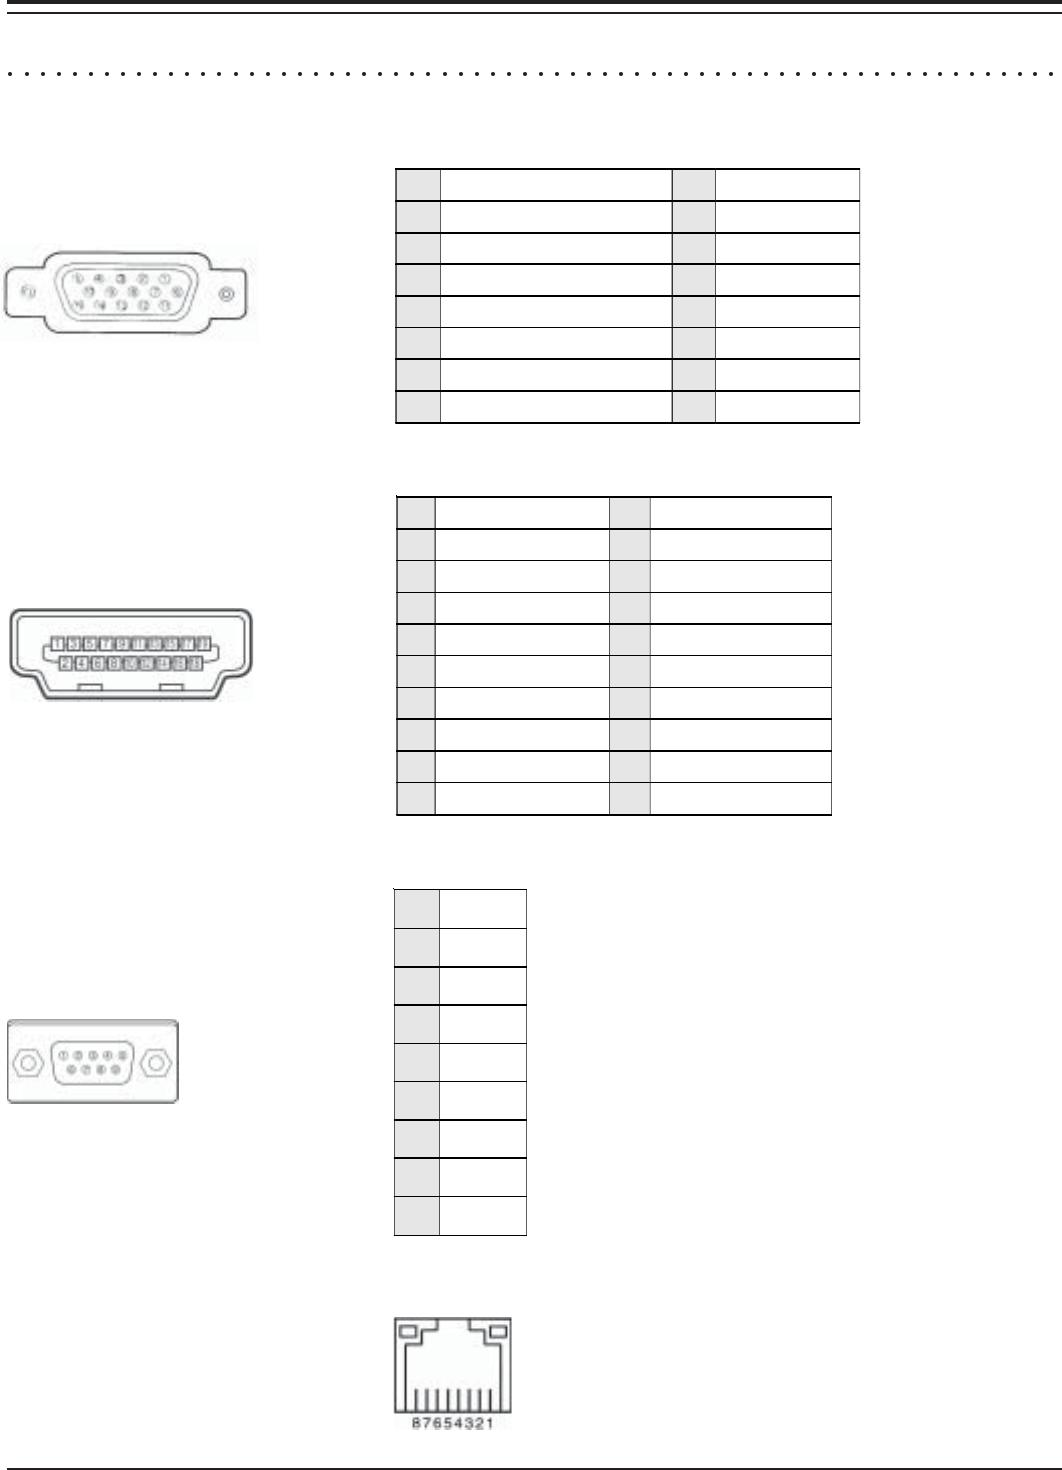 Handleiding Sanyo plc wxu300 (pagina 75 van 76) (Nederlands)